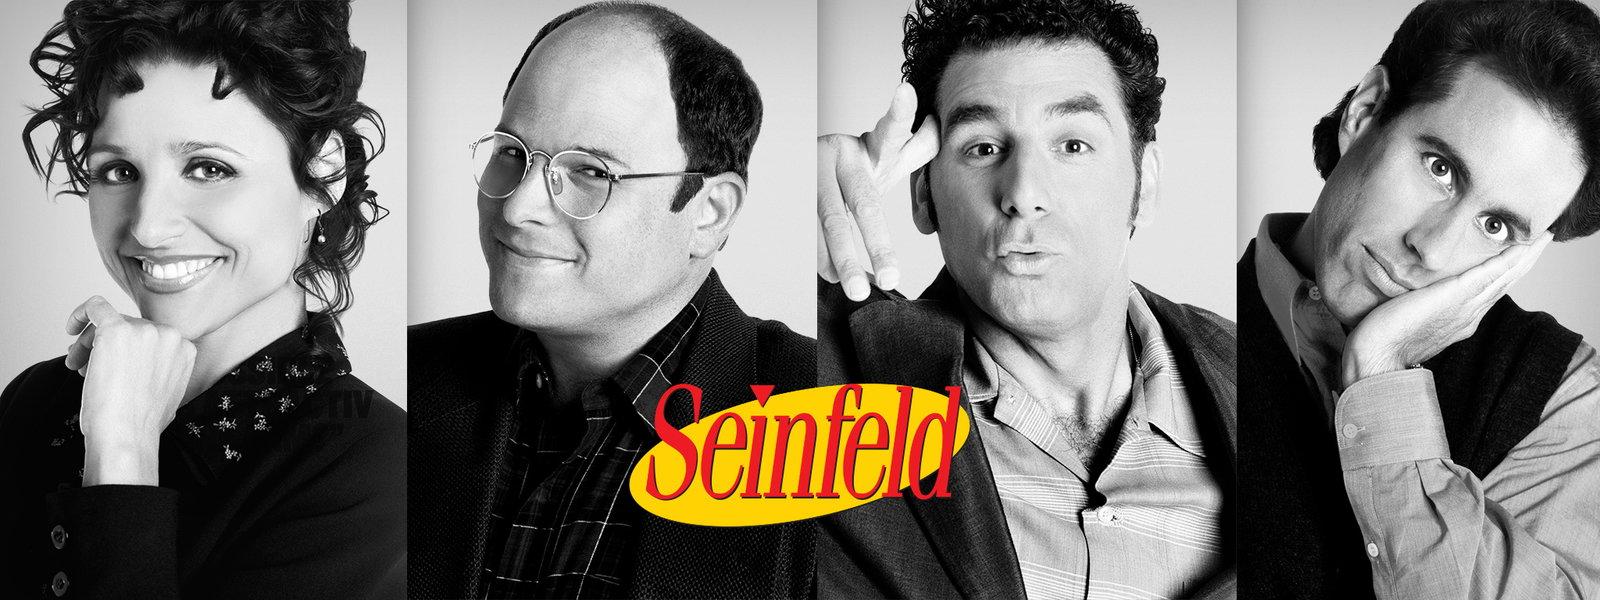 Top 10 favorite Seinfeld episodes